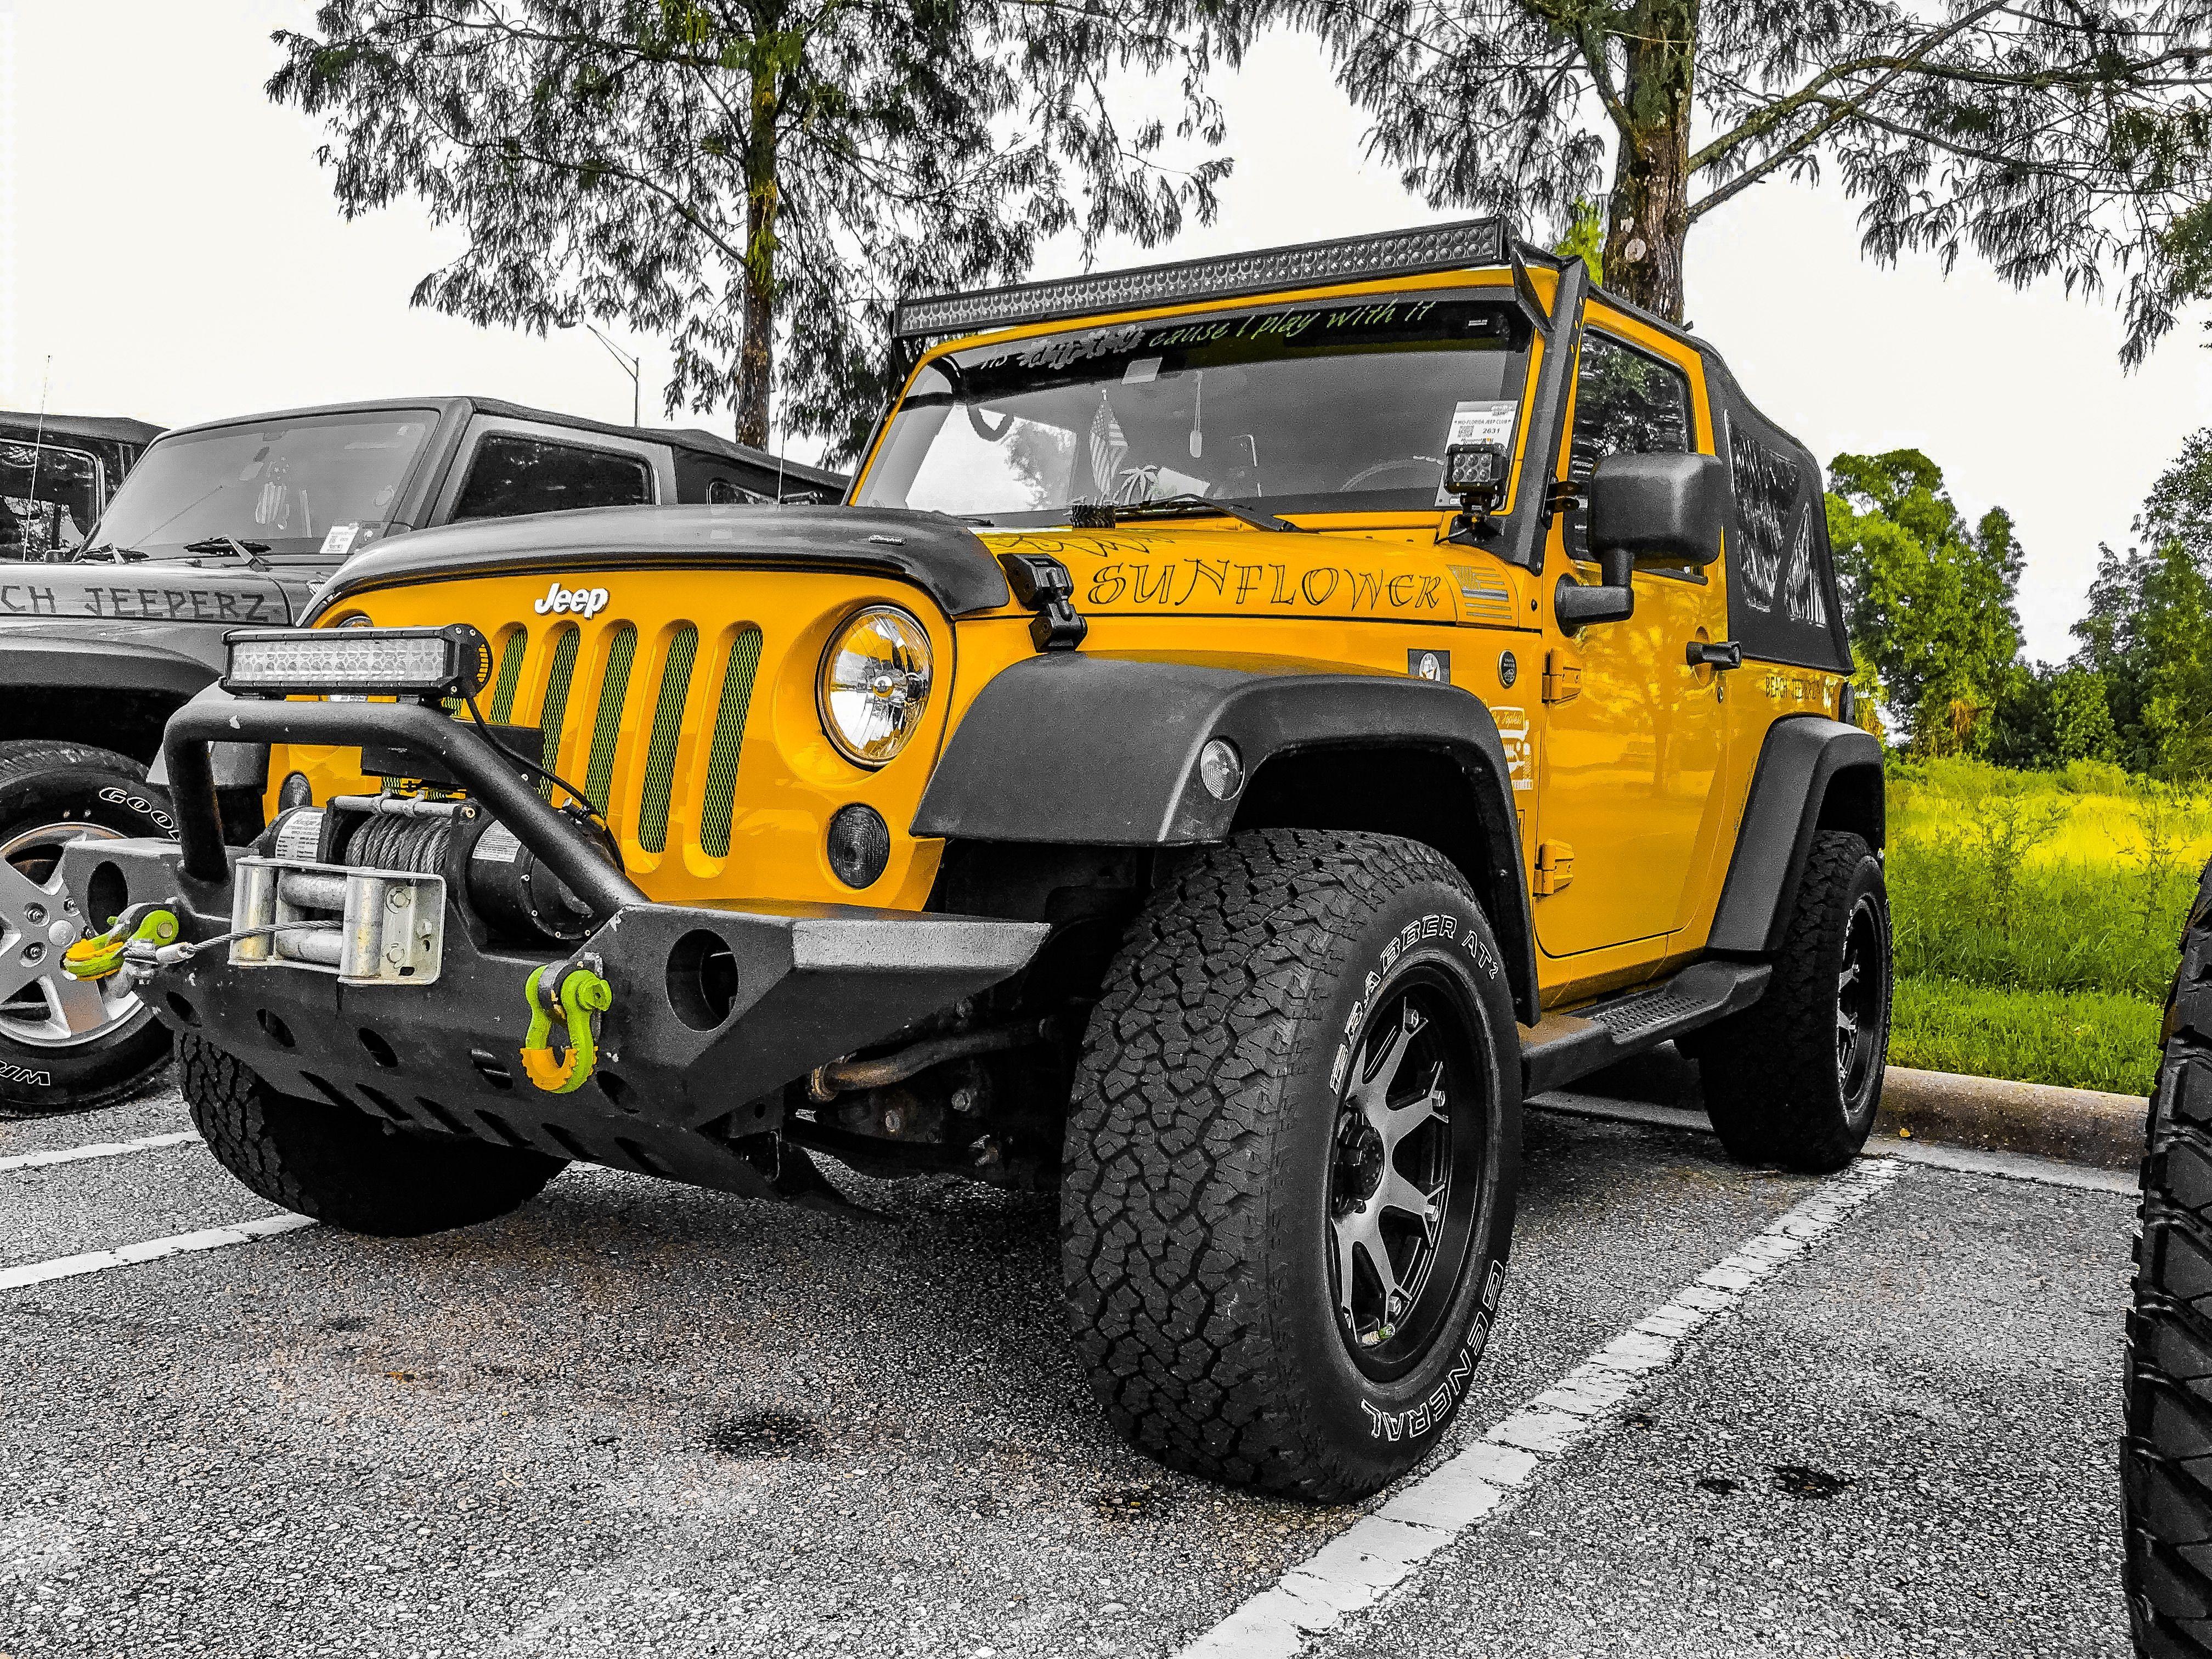 The Sunflower Jeep Naplesflorida Sweet Ride Monster Trucks Jeep